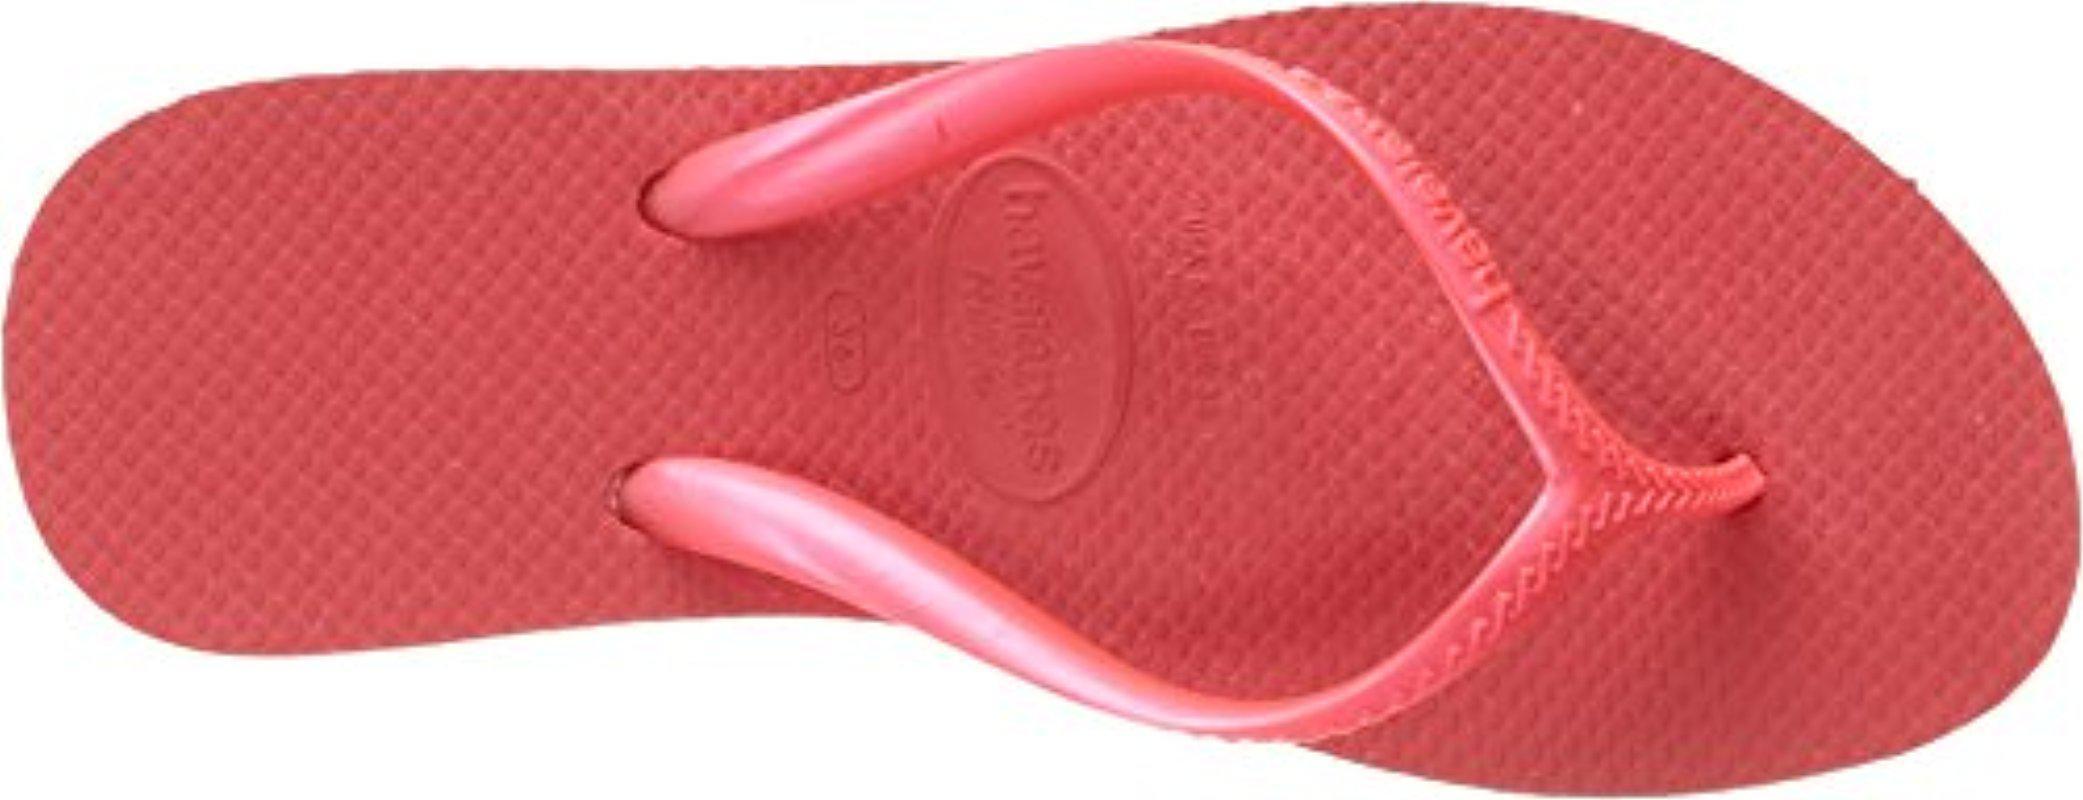 0677a6759c827 Lyst - Havaianas High Light Flip Flop Sandals